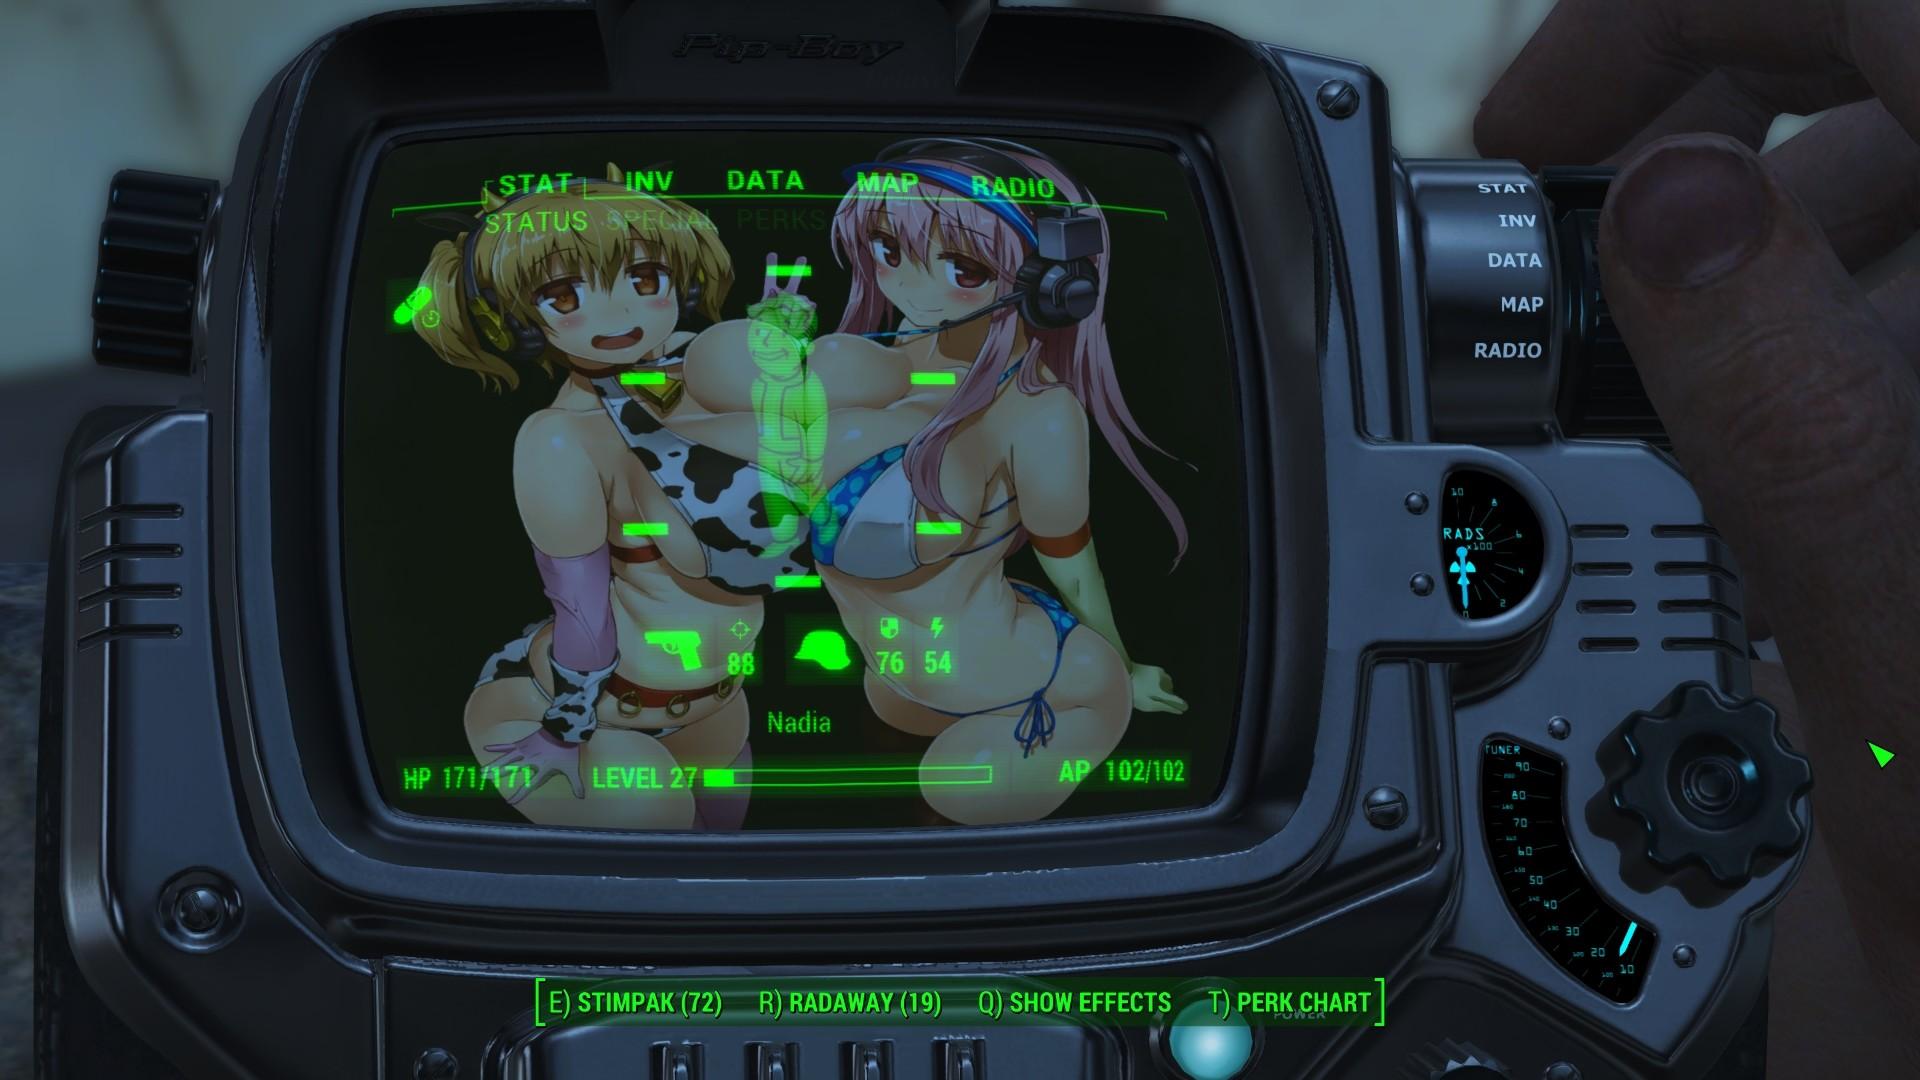 Modern Warfare Wallpaper Hd Fallout Pip Boy Wallpaper Hd 76 Images